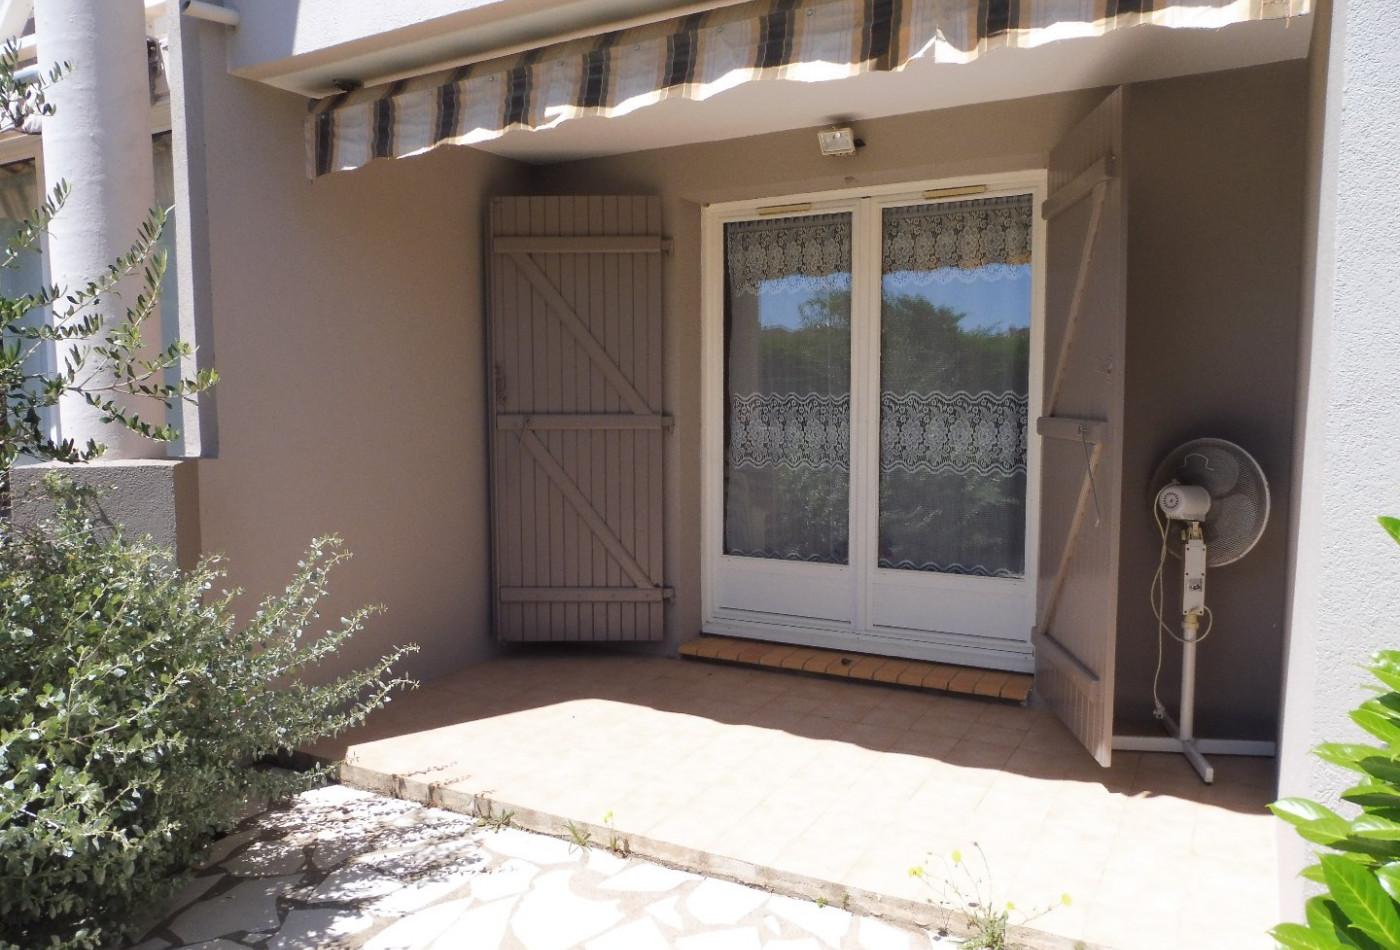 A vendre  Valras Plage | Réf 342042556 - Cabinet barthes